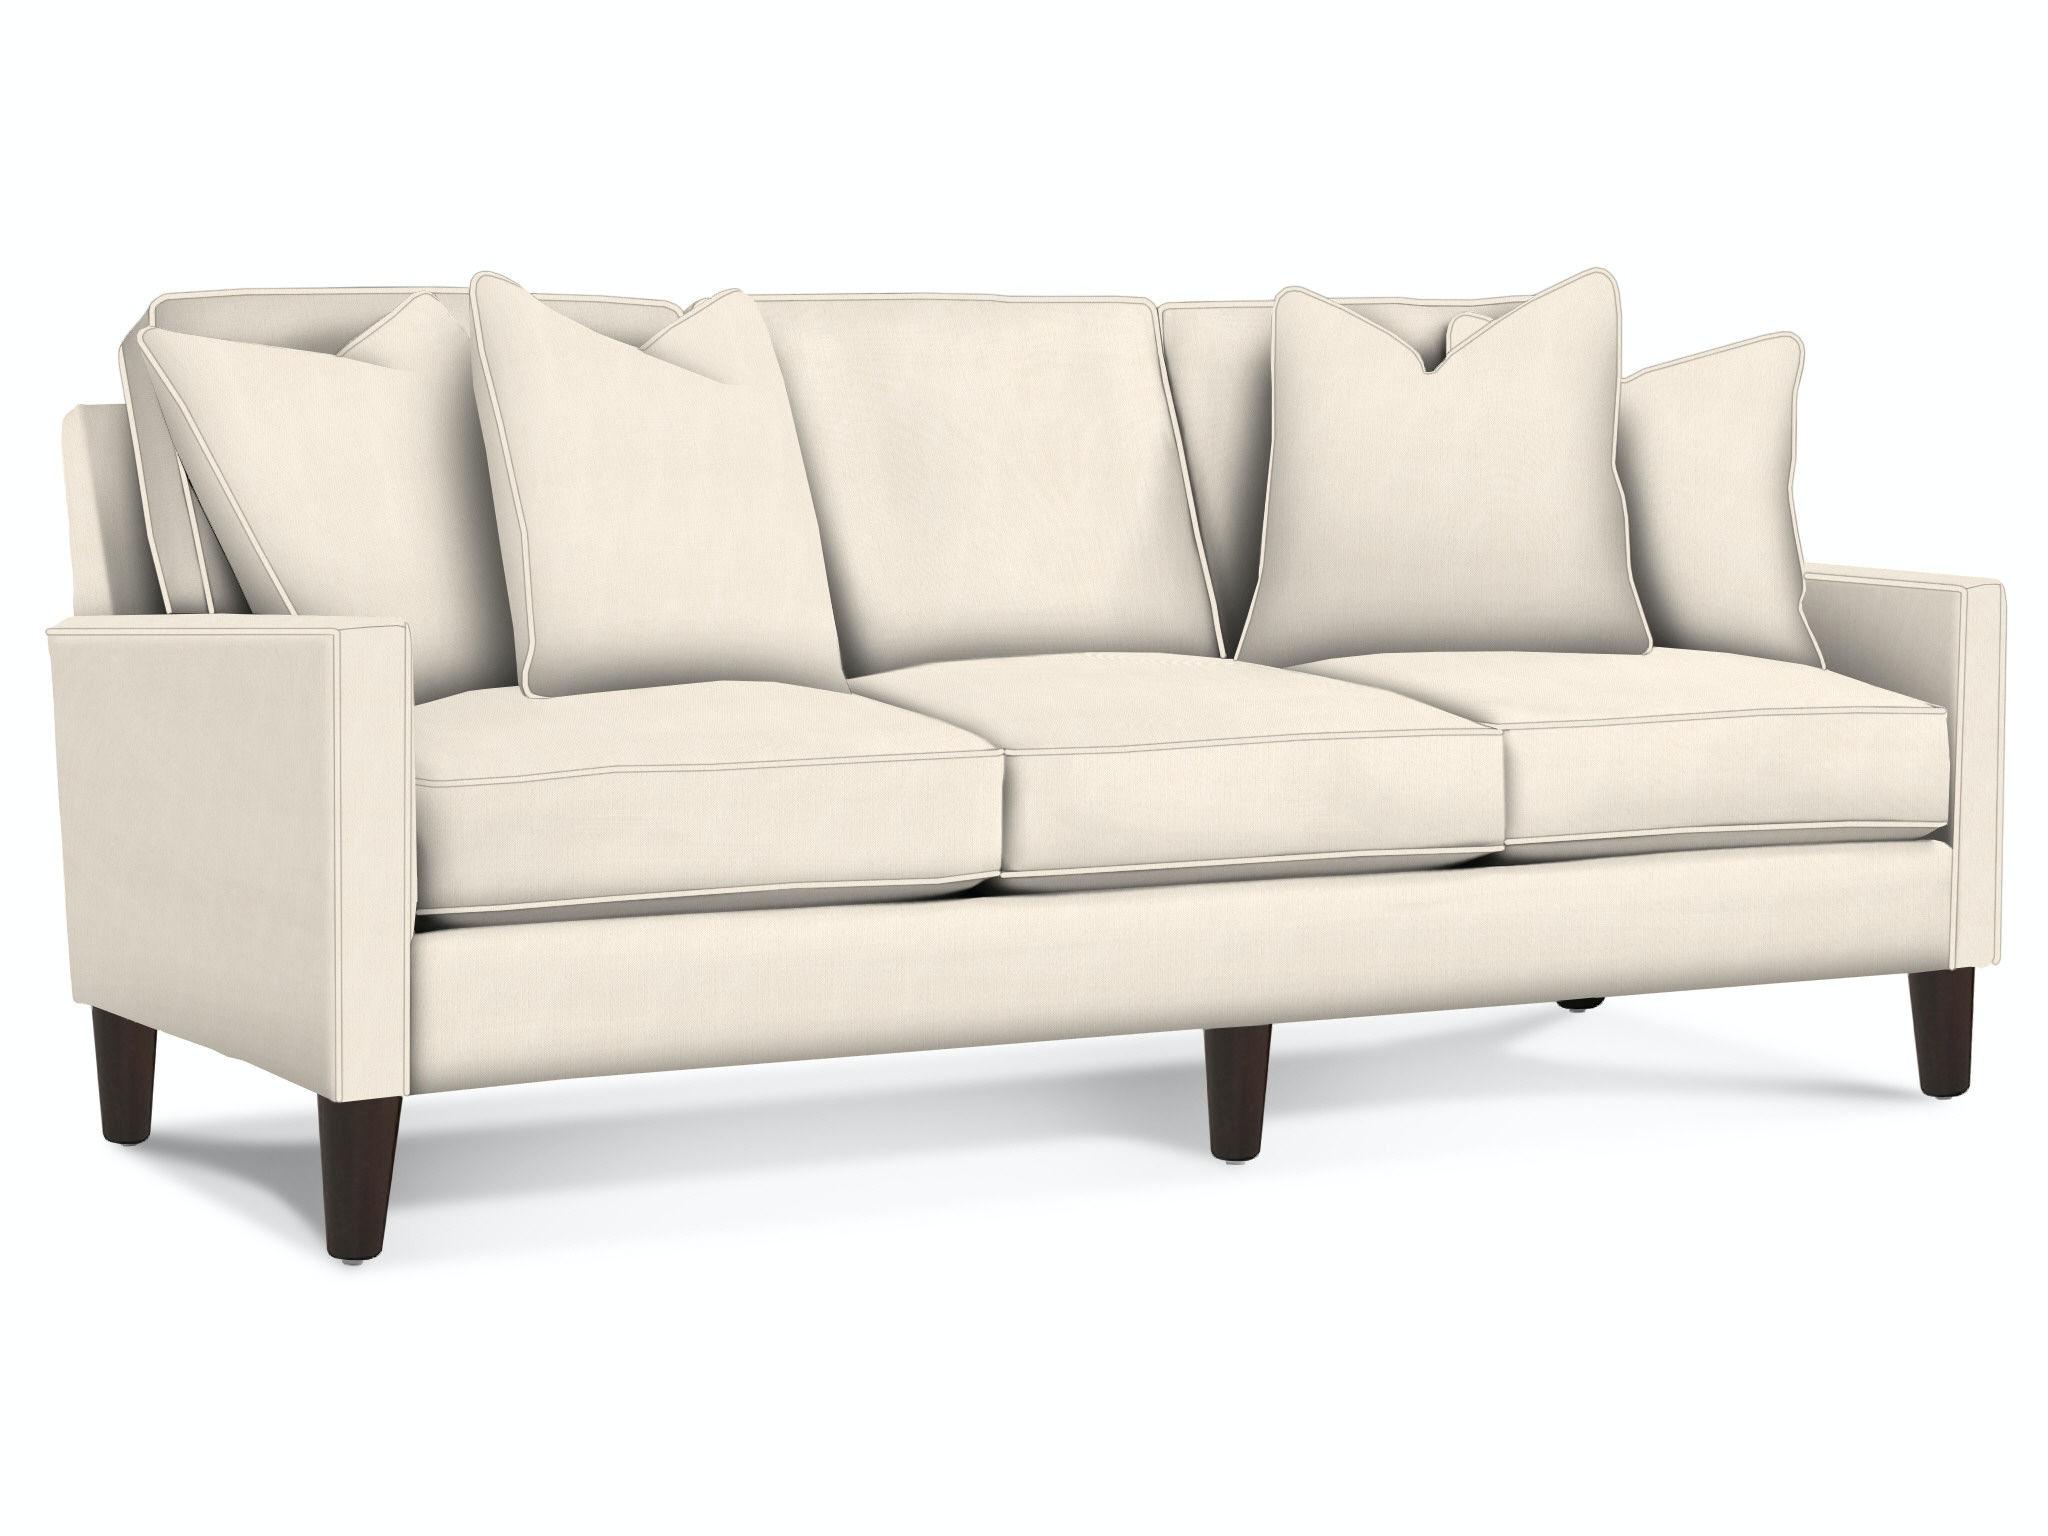 Braxton Culler Sofa A000 011